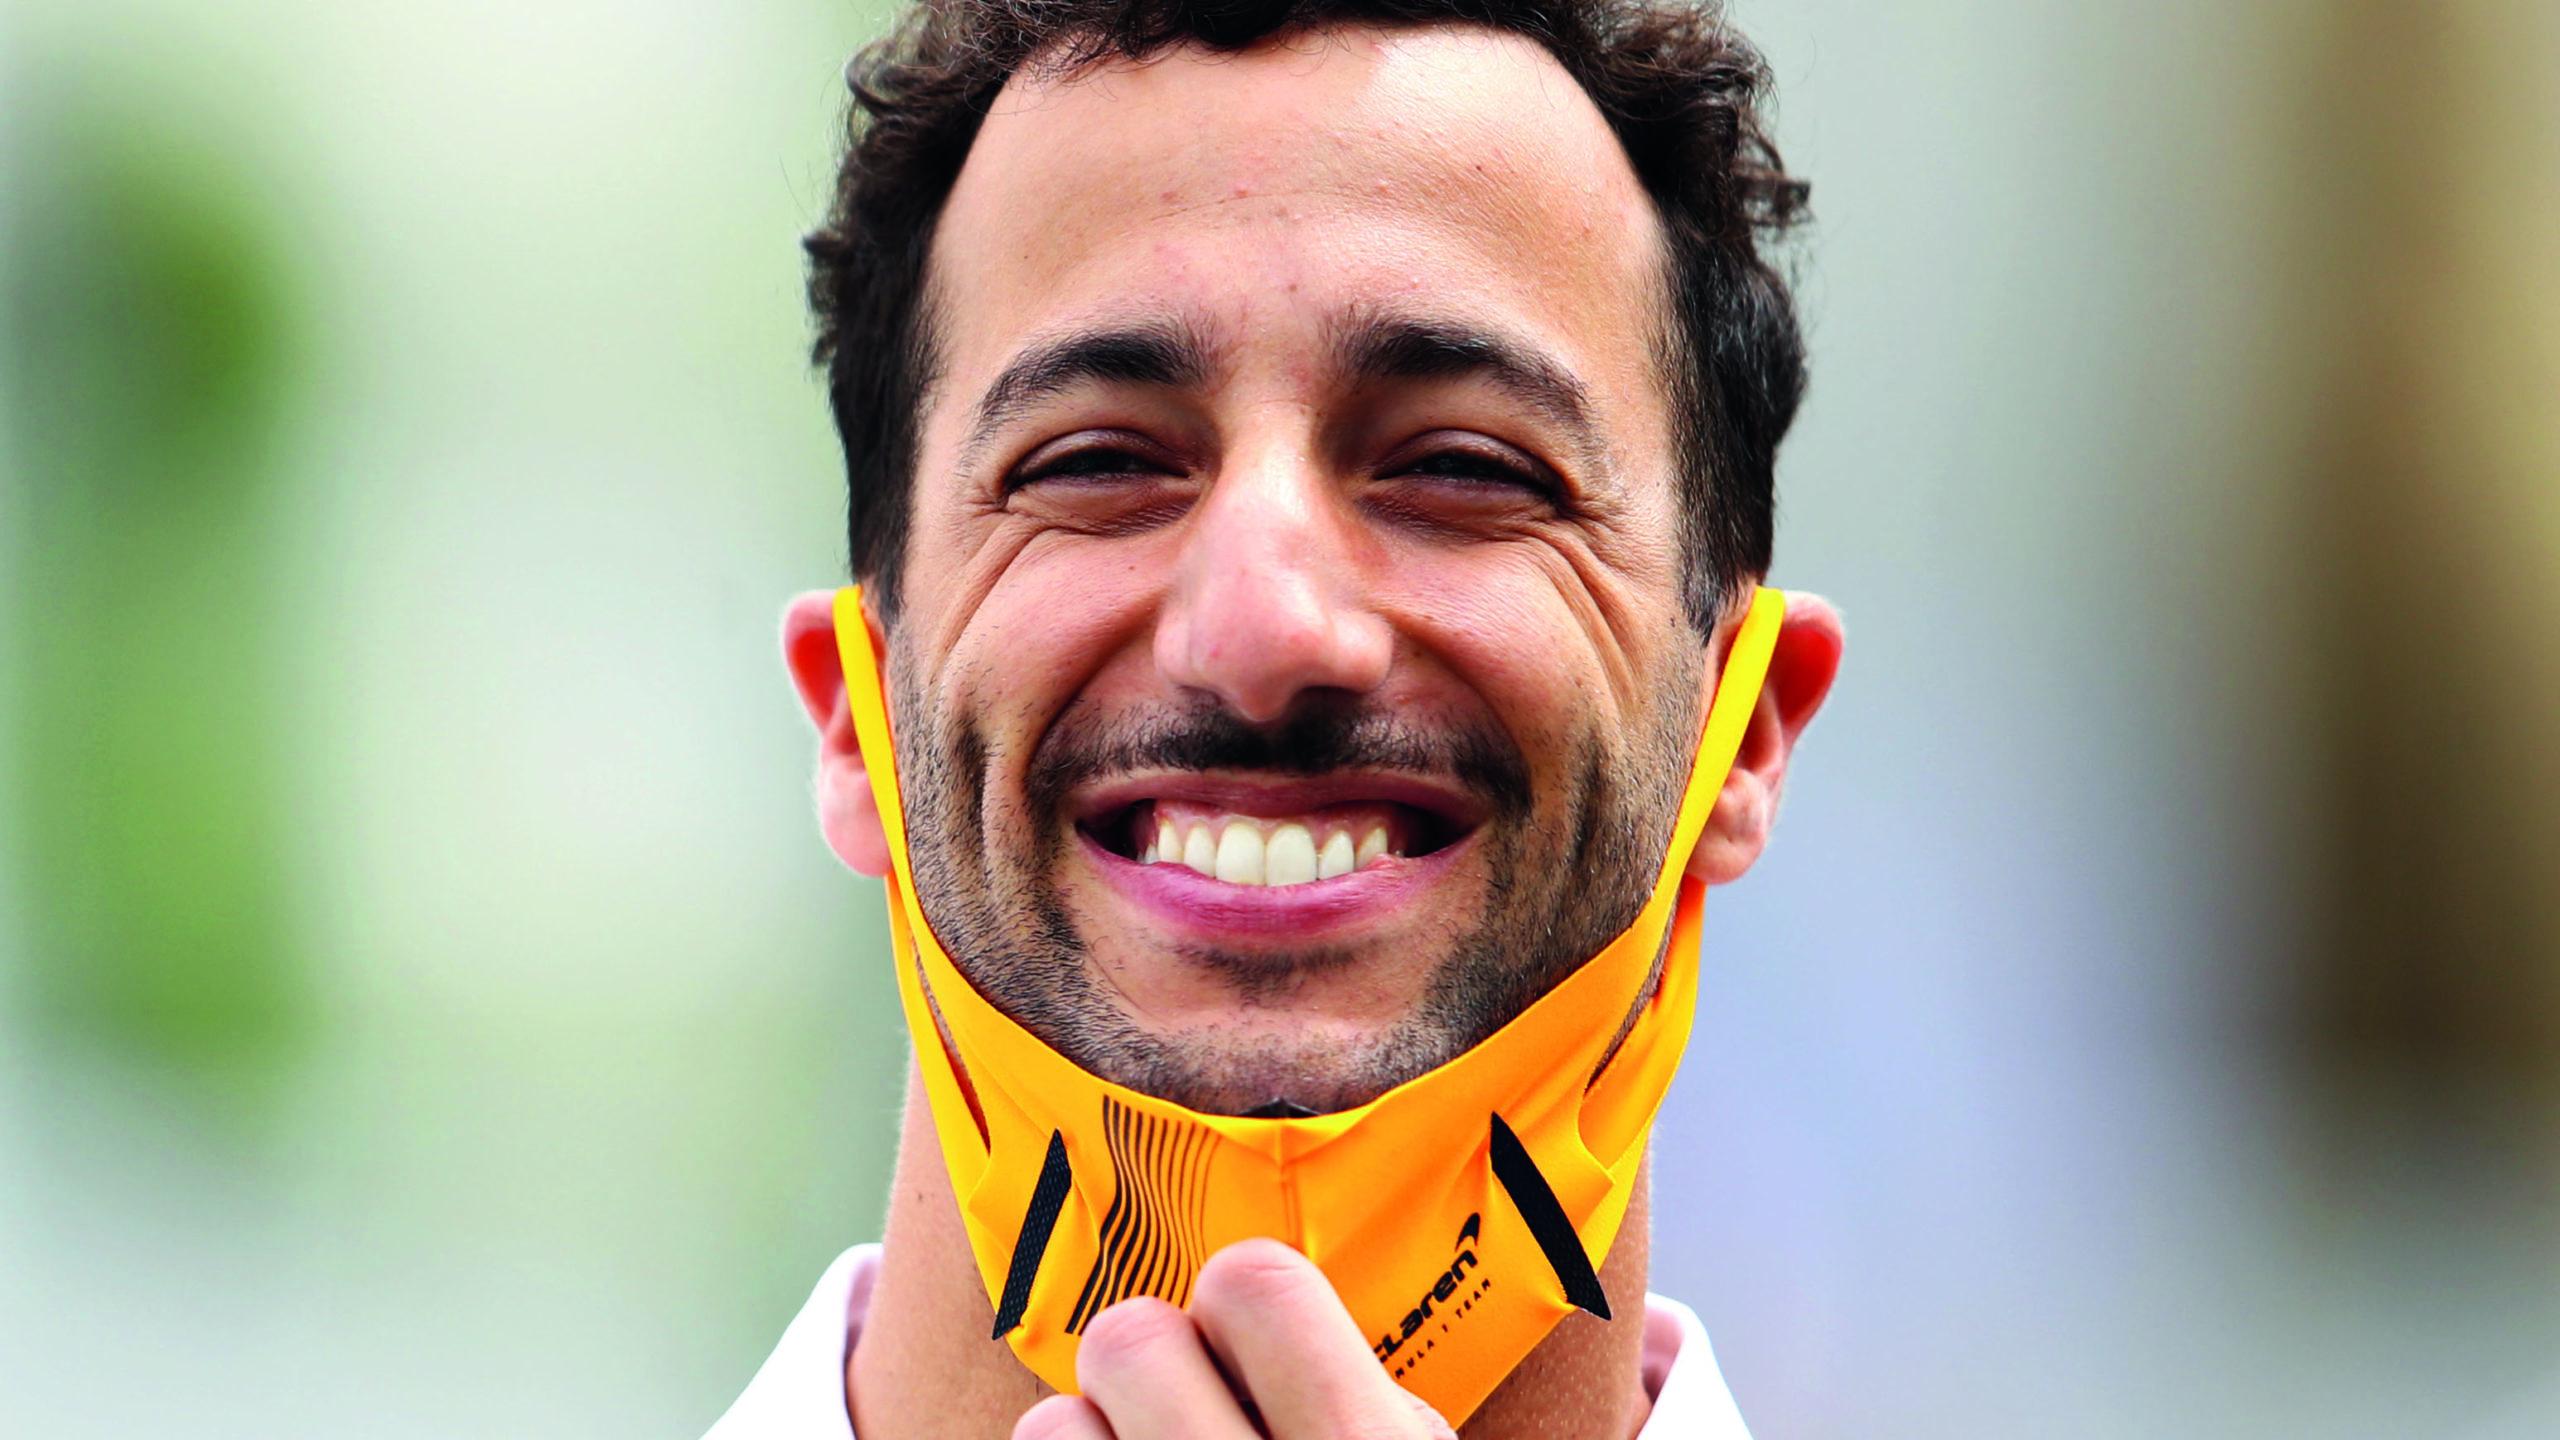 Daniel-Ricciardo-smiling-with-facemask